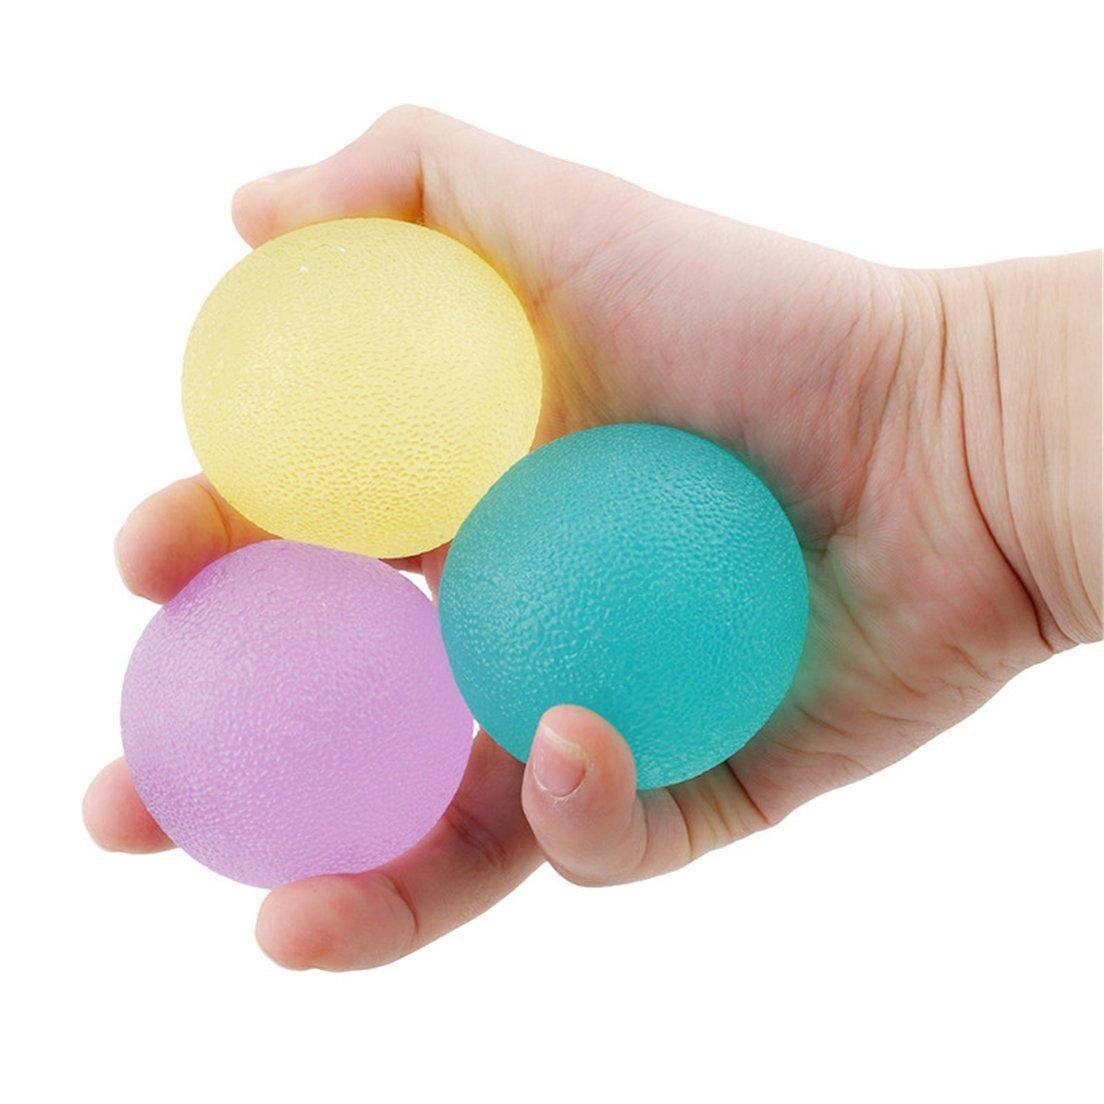 Lipower 握力用品 ボール トレーニング マッサージ感覚のトレーニング 握る力の強化 血行促進に効果